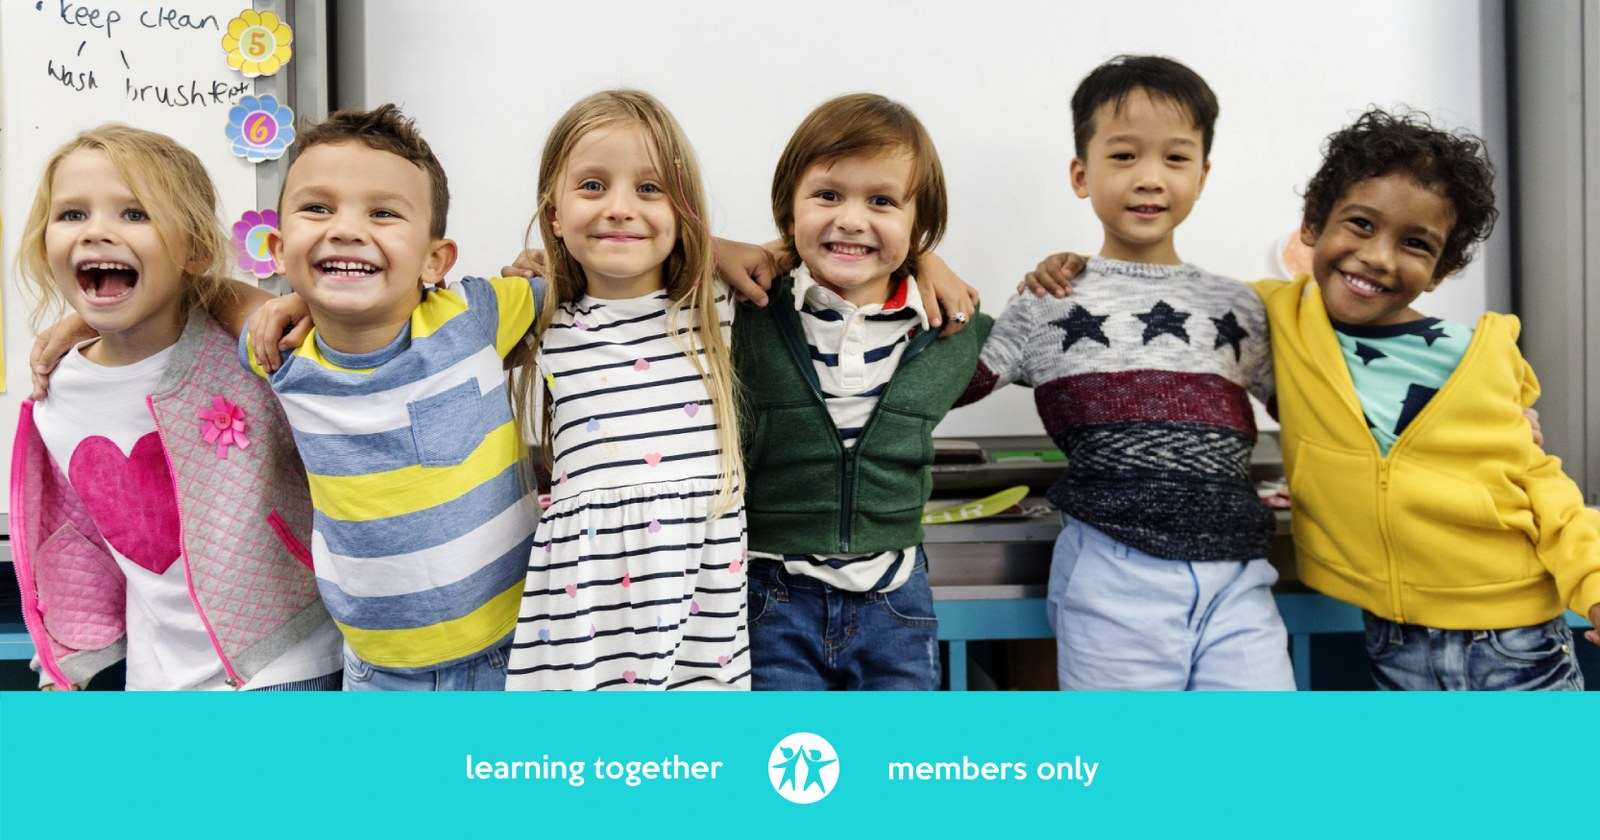 Teaching multilingual children in mainstream classrooms